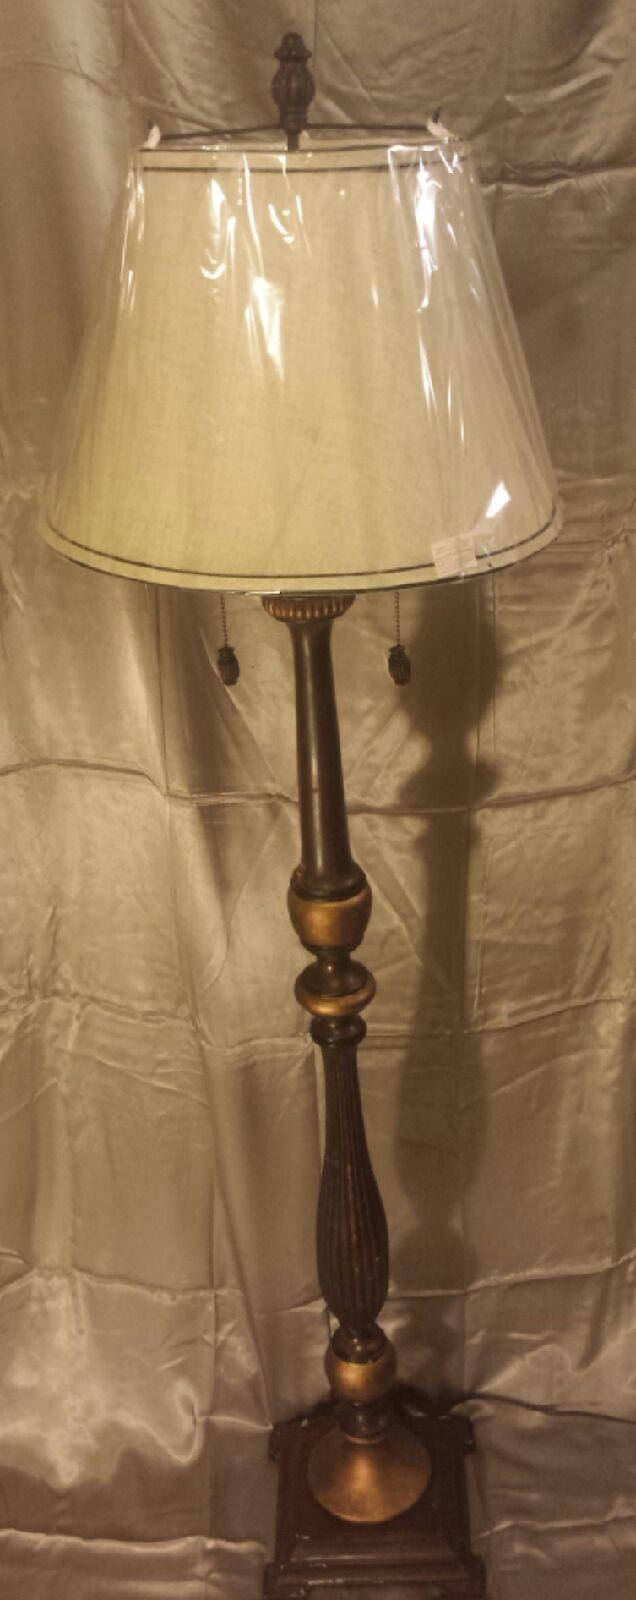 5u00274 Floor Lamp In Ourglassu0027 Garage Sale In Fort Gibson , OK For